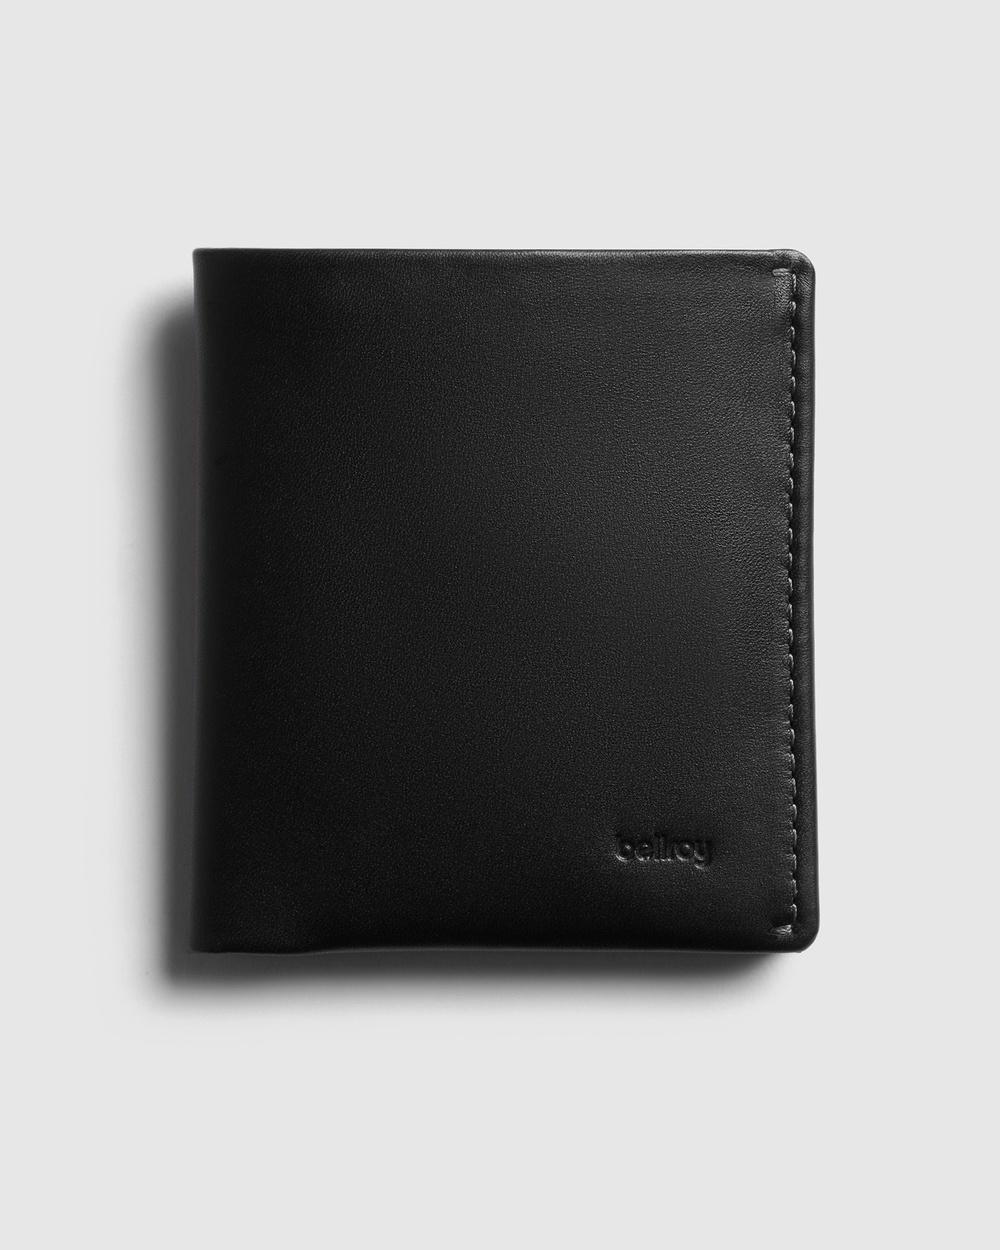 Bellroy Note Sleeve Wallets Black